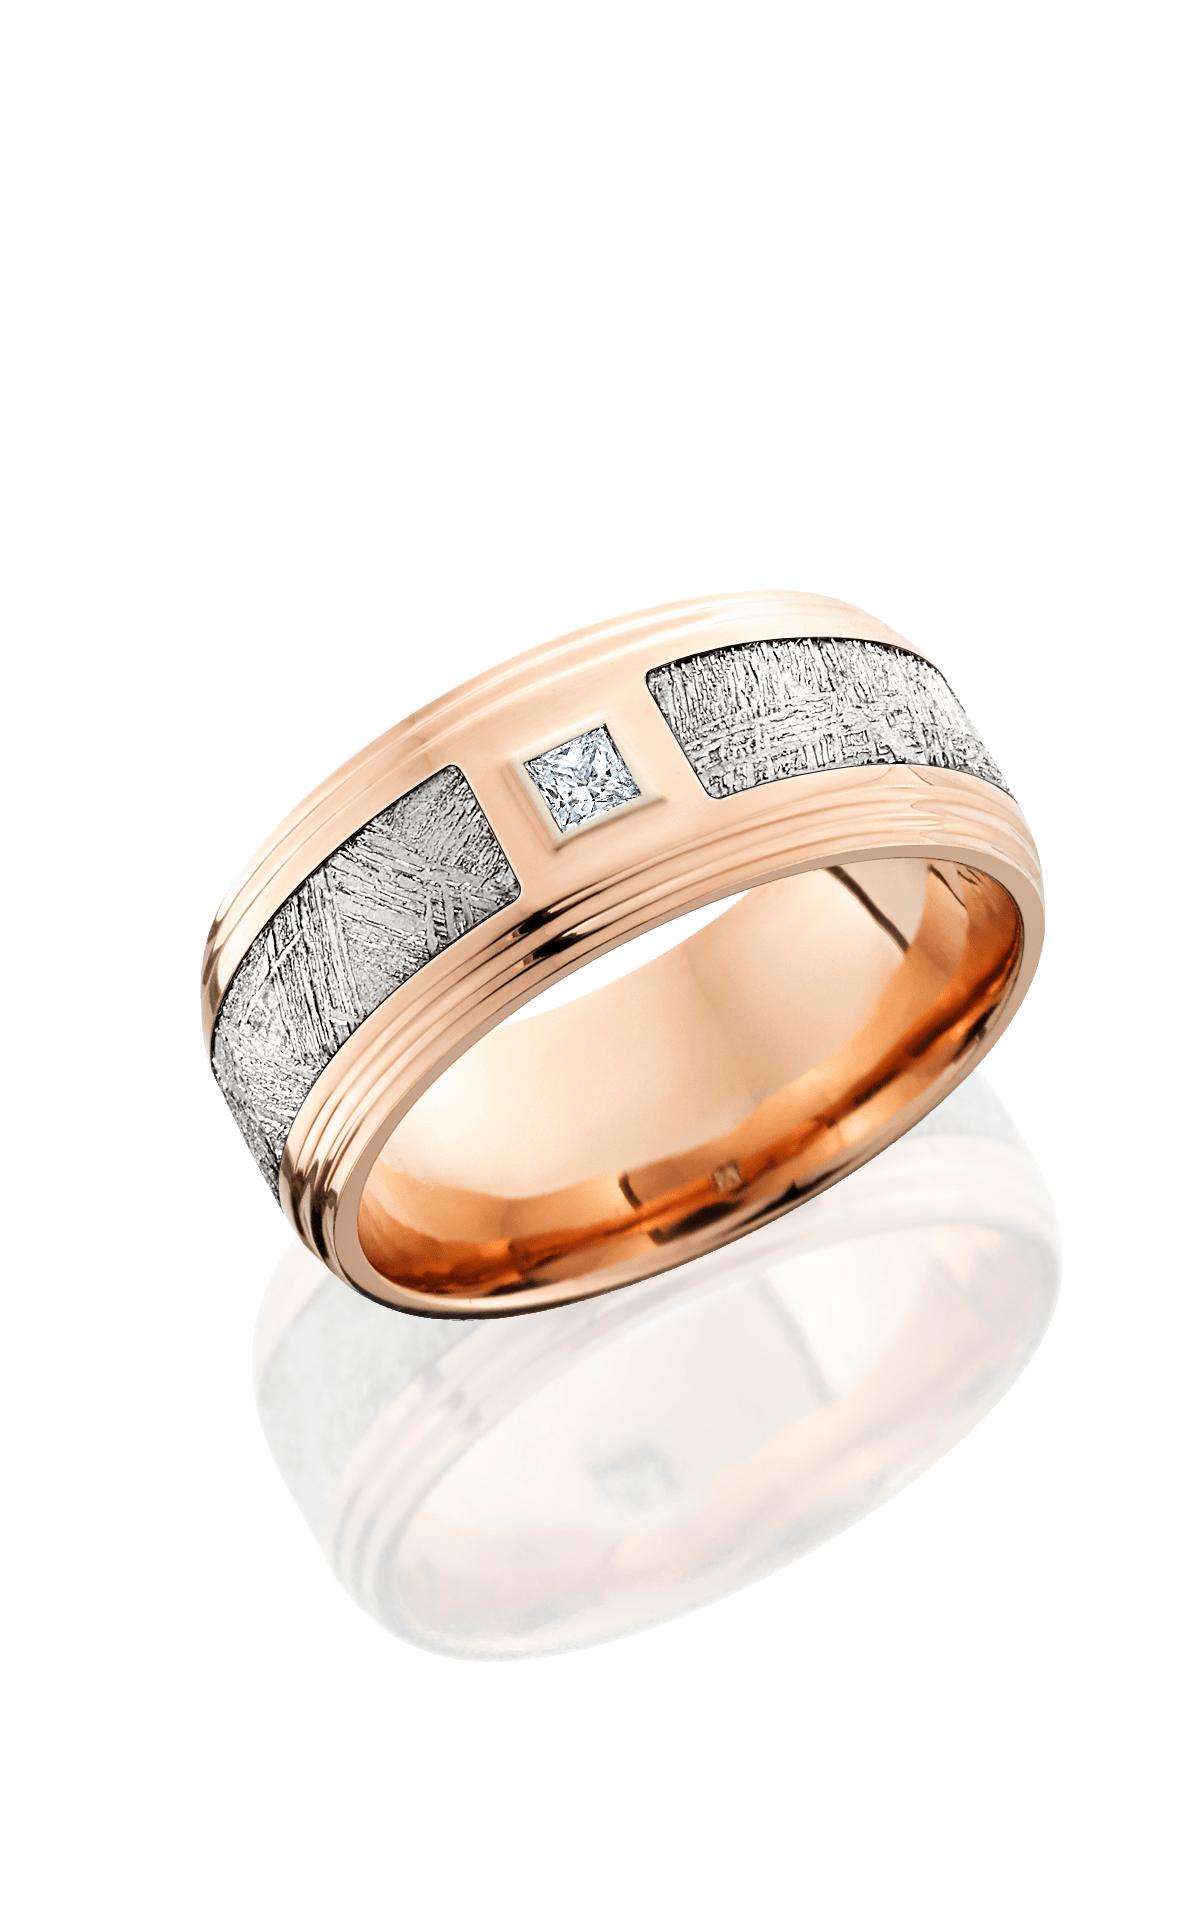 EN wedding ring Lashbrook Precious Metals Wedding band